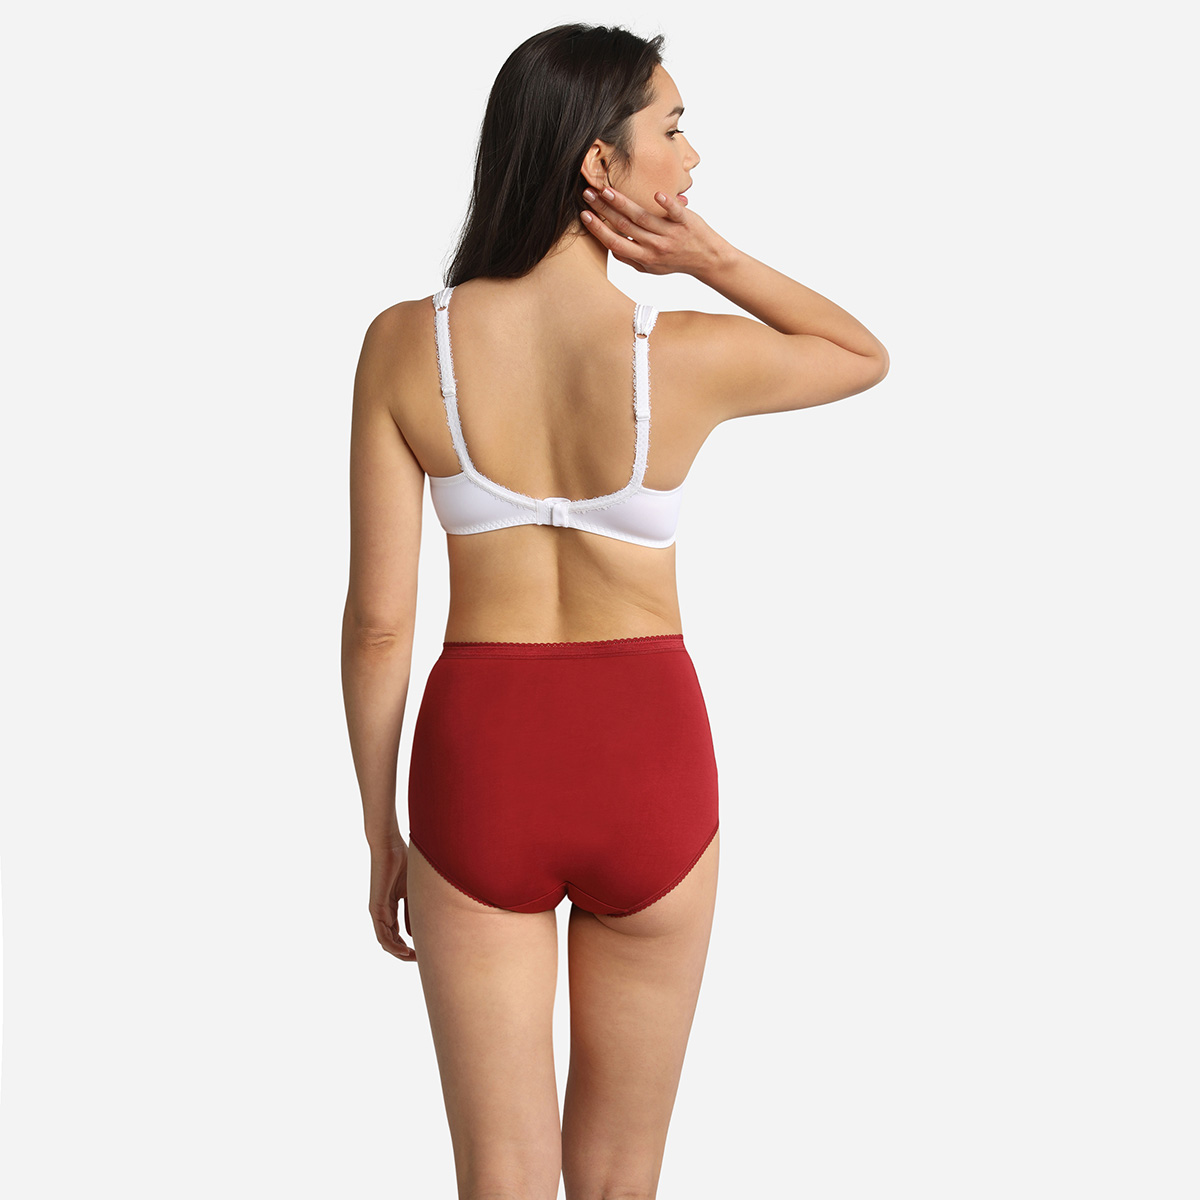 Pacco da 3 slip vita alta rosso, bianco e beige Cotton Stretch, , PLAYTEX